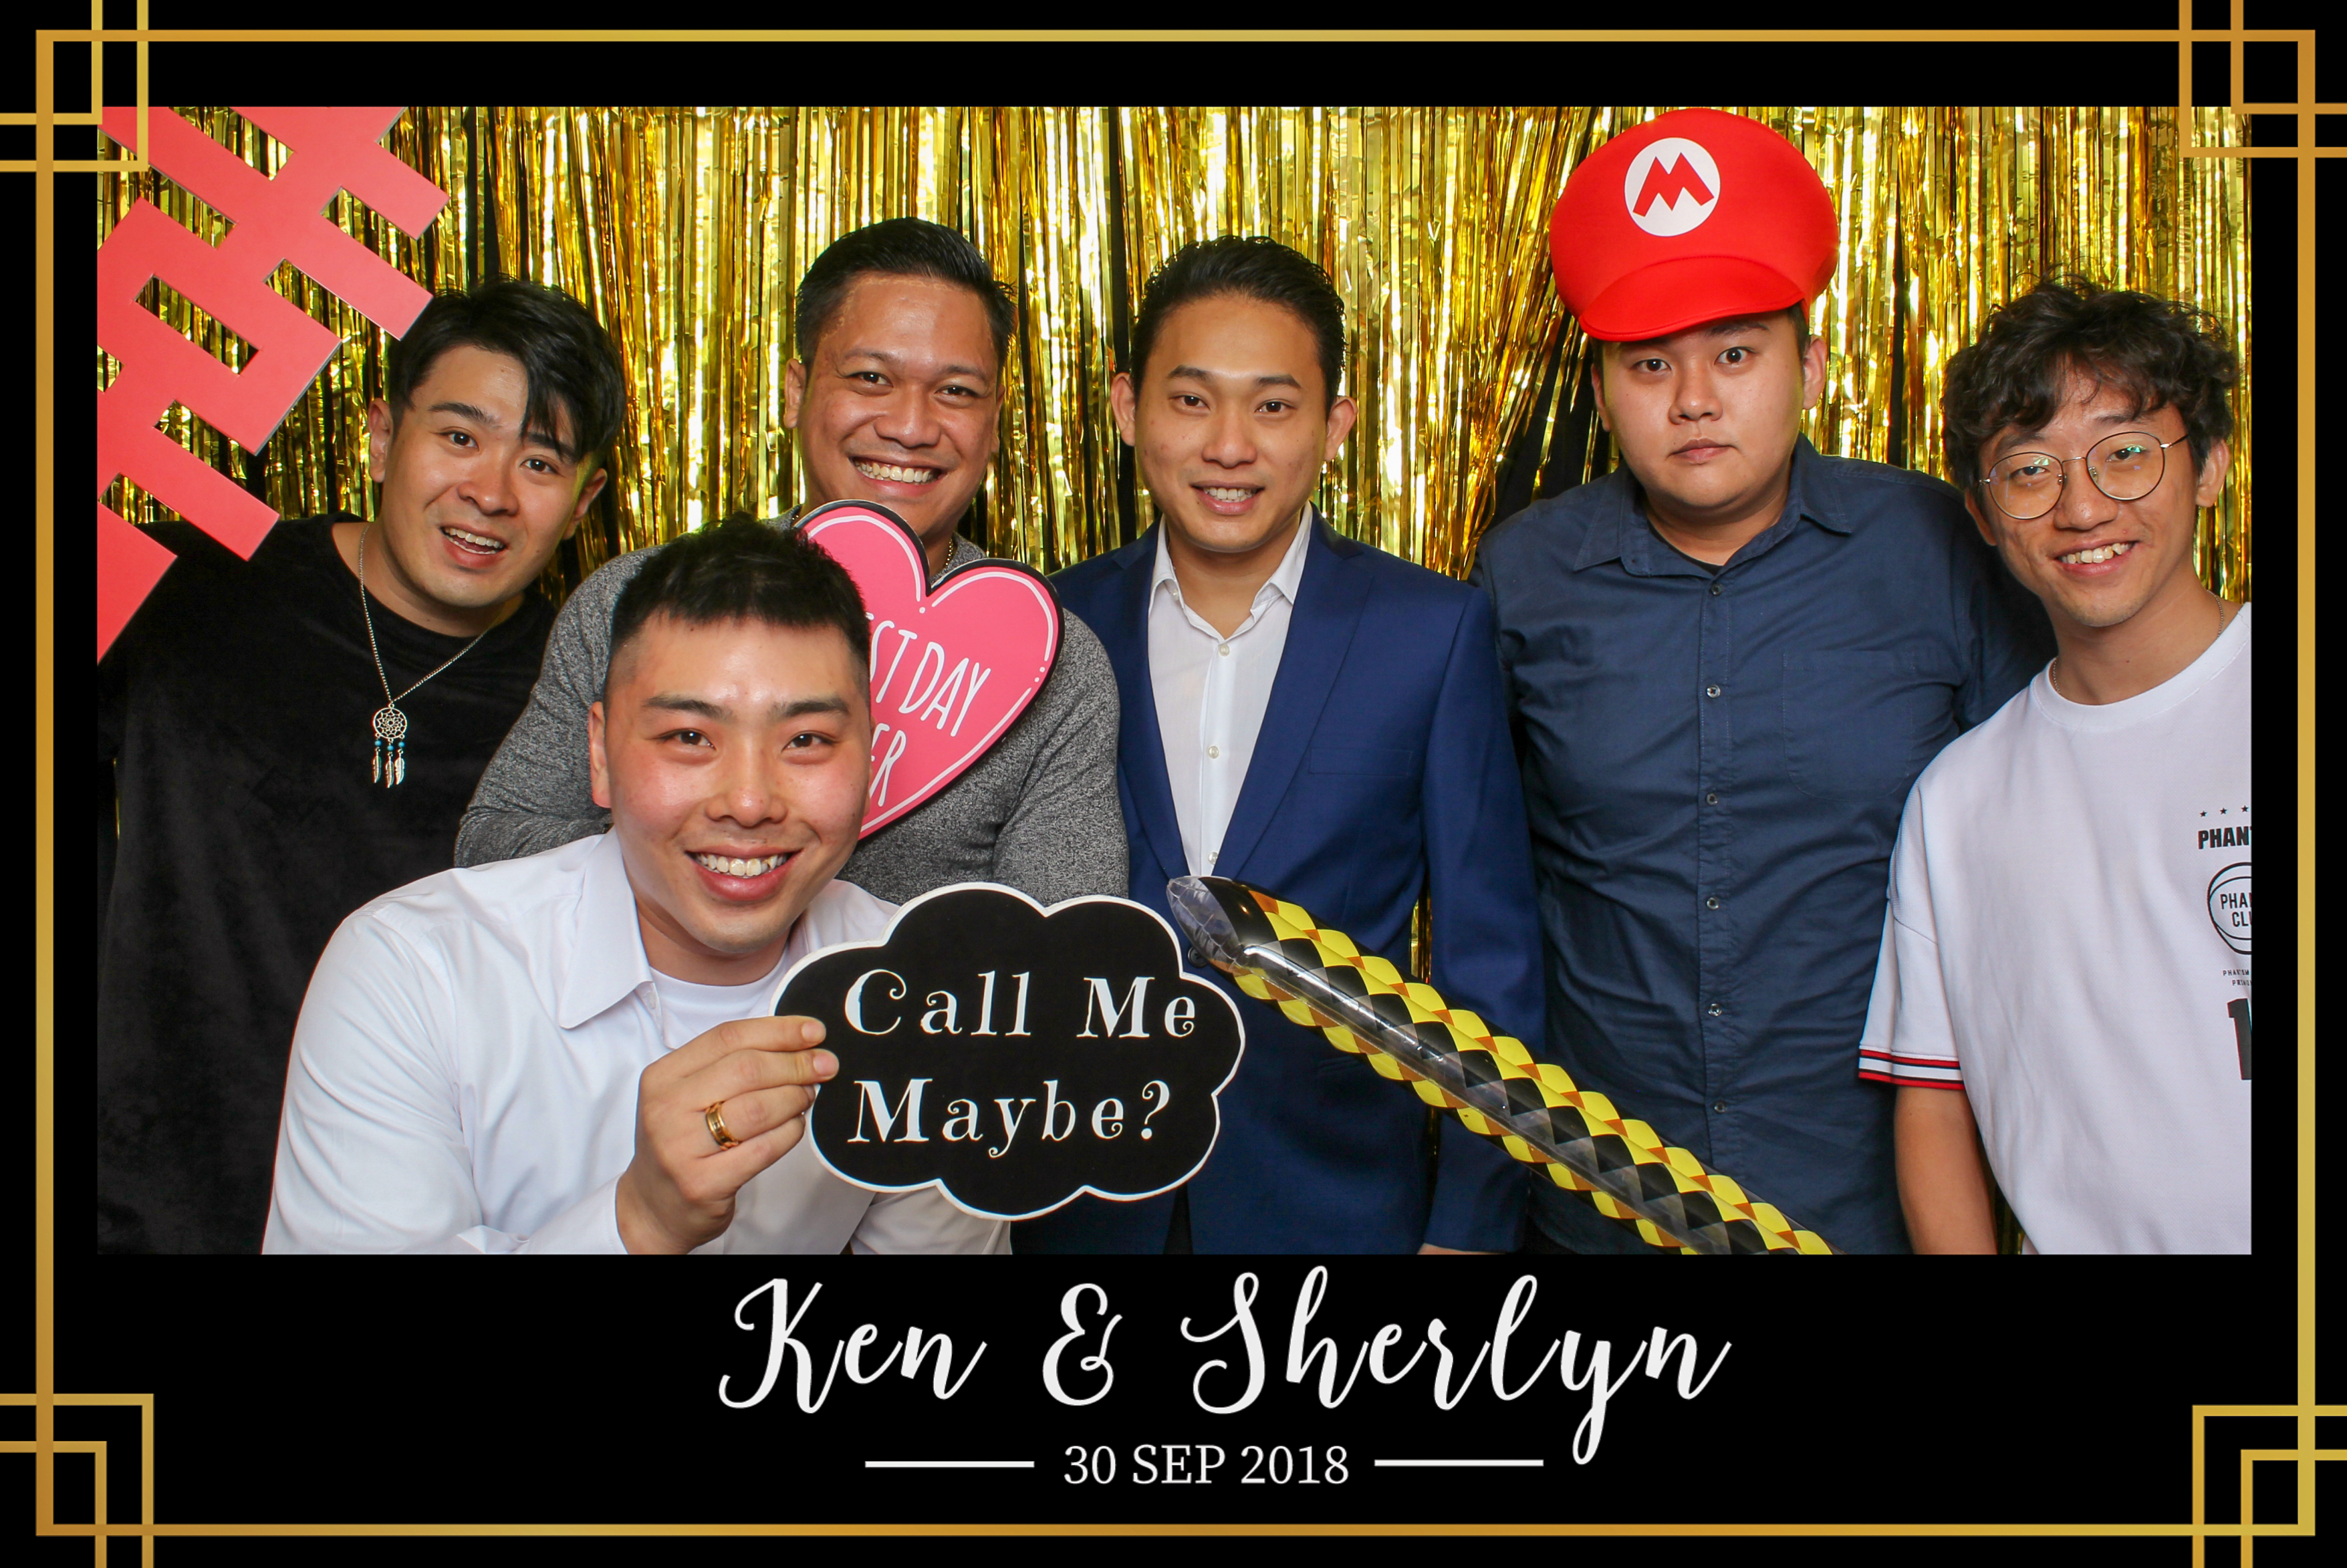 Ken Sherlyn wedding photo booth (47)